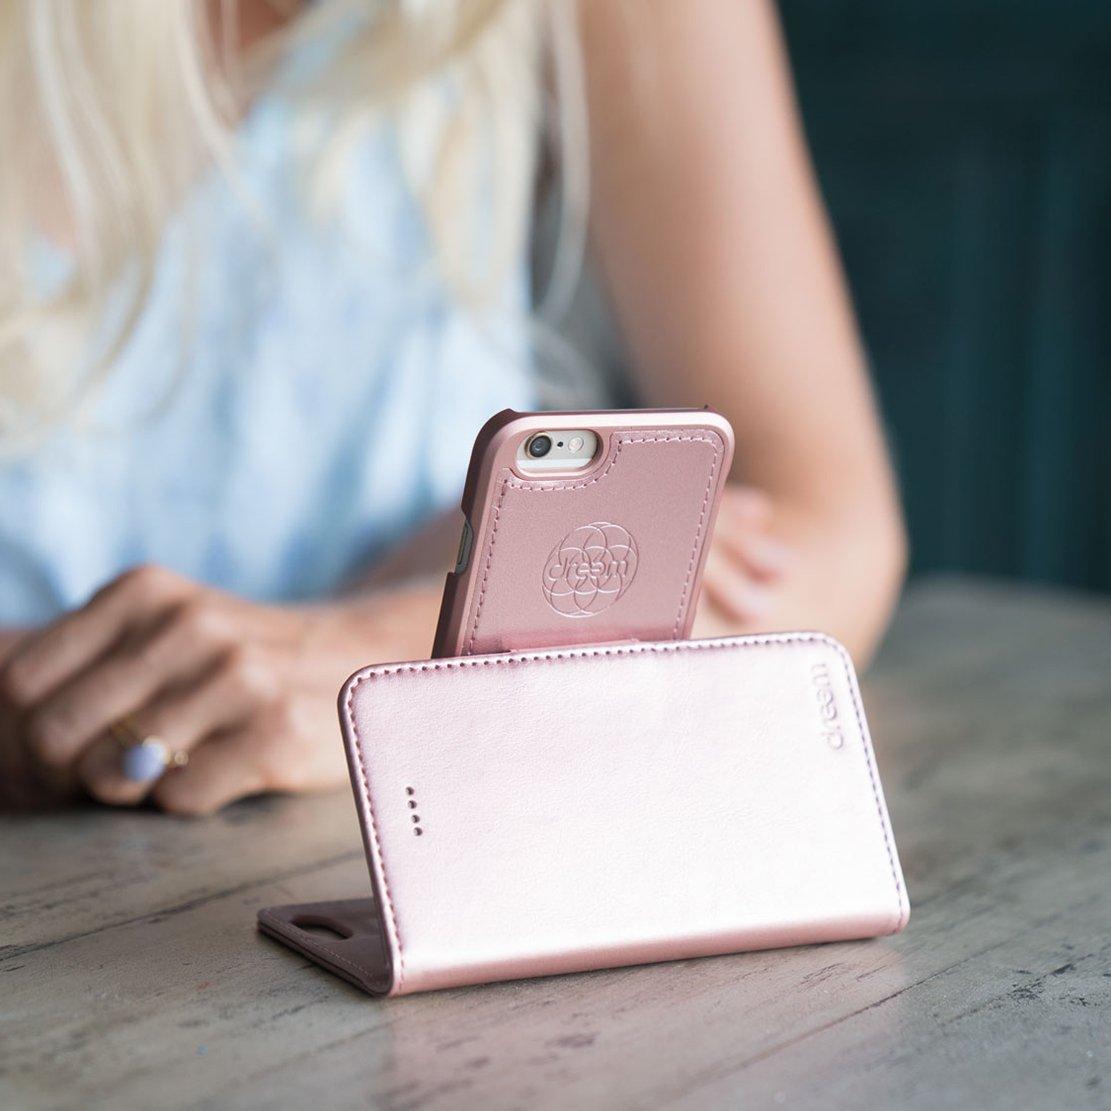 dreem iphone 7 & 8 wallet case with detachable slimcase